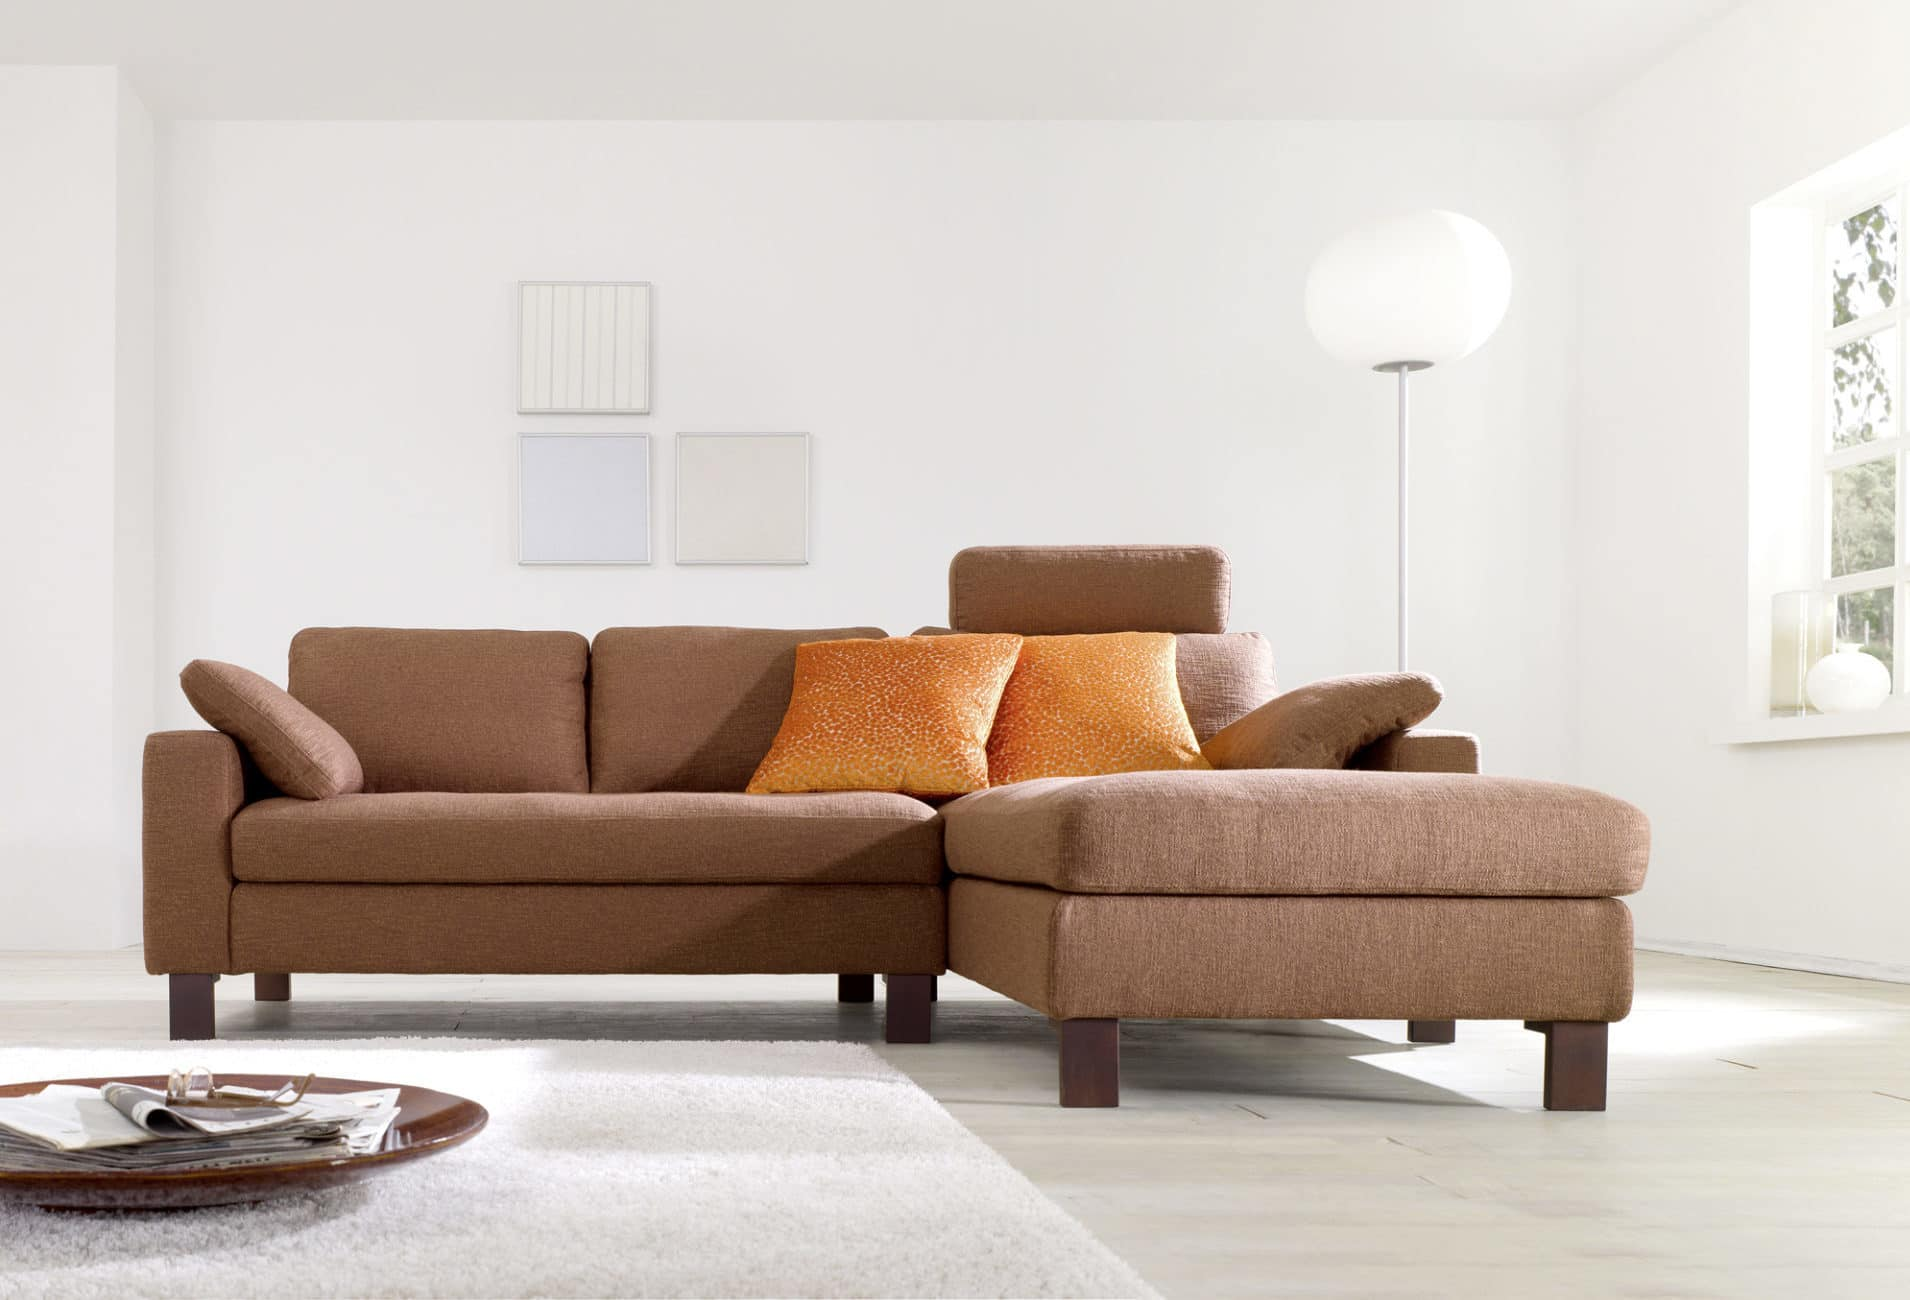 sofasystem siena 2 sitzer ko control. Black Bedroom Furniture Sets. Home Design Ideas